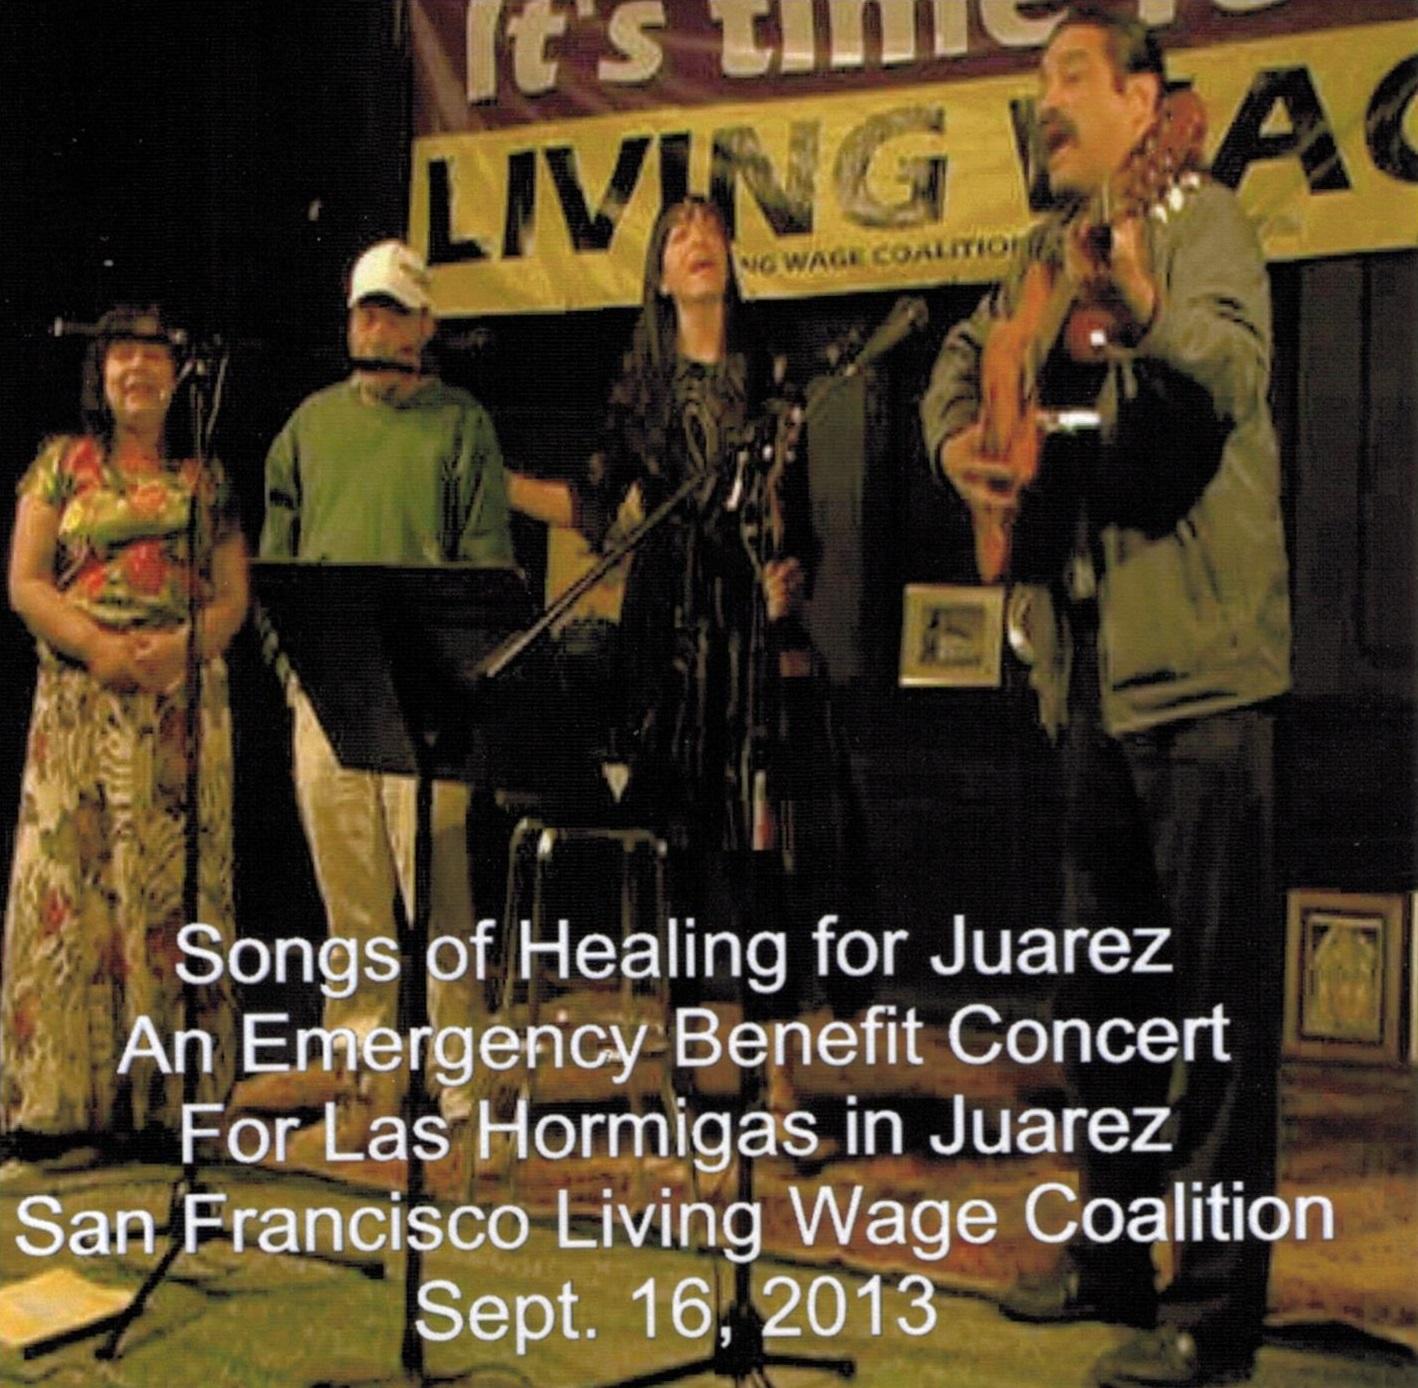 Songs of Healing for Juarez